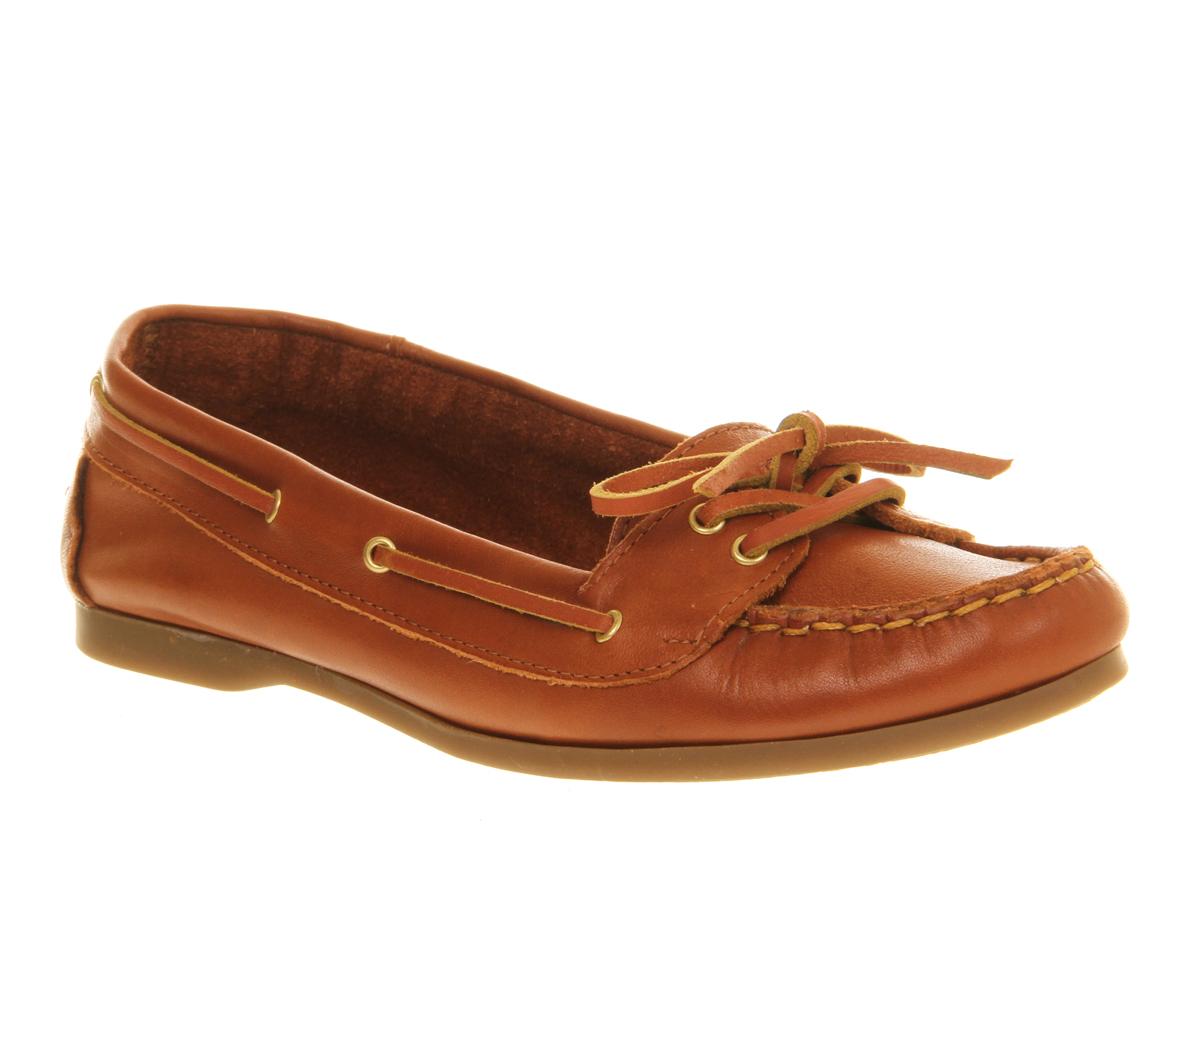 Office Marina Lace Womens Flats Tan Leather